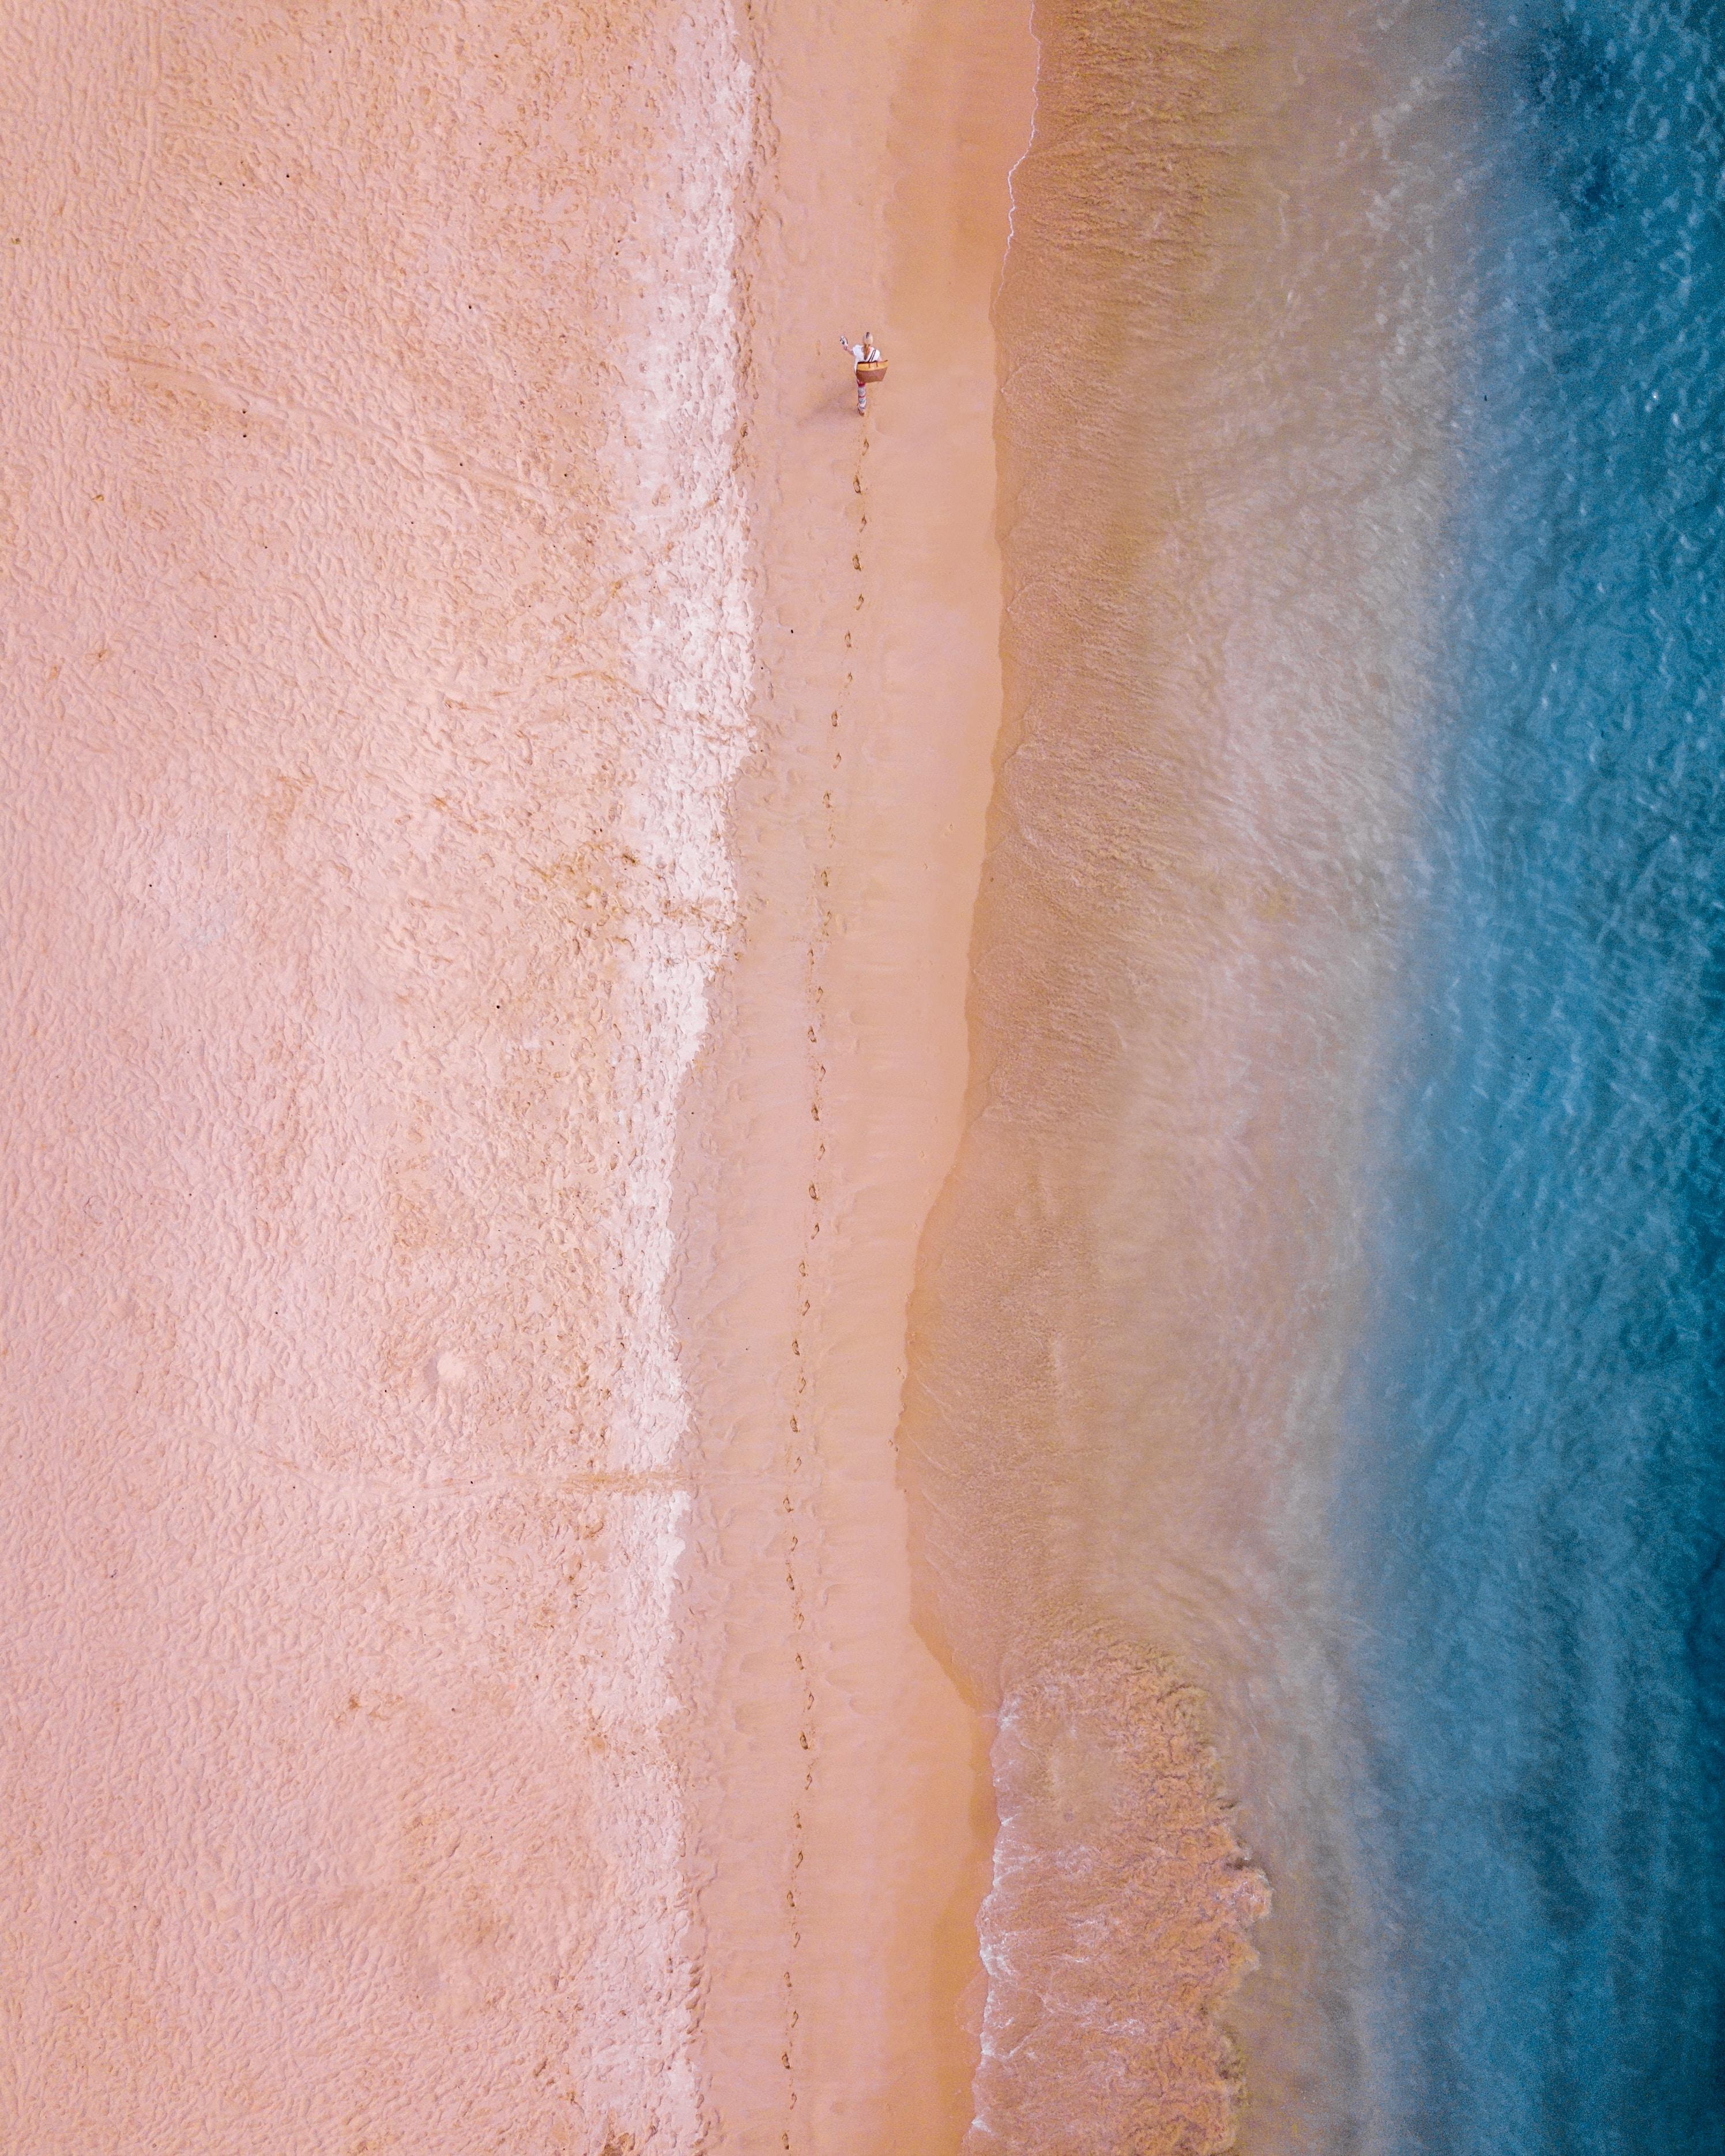 person walking on sand near seashore leaving foot trails